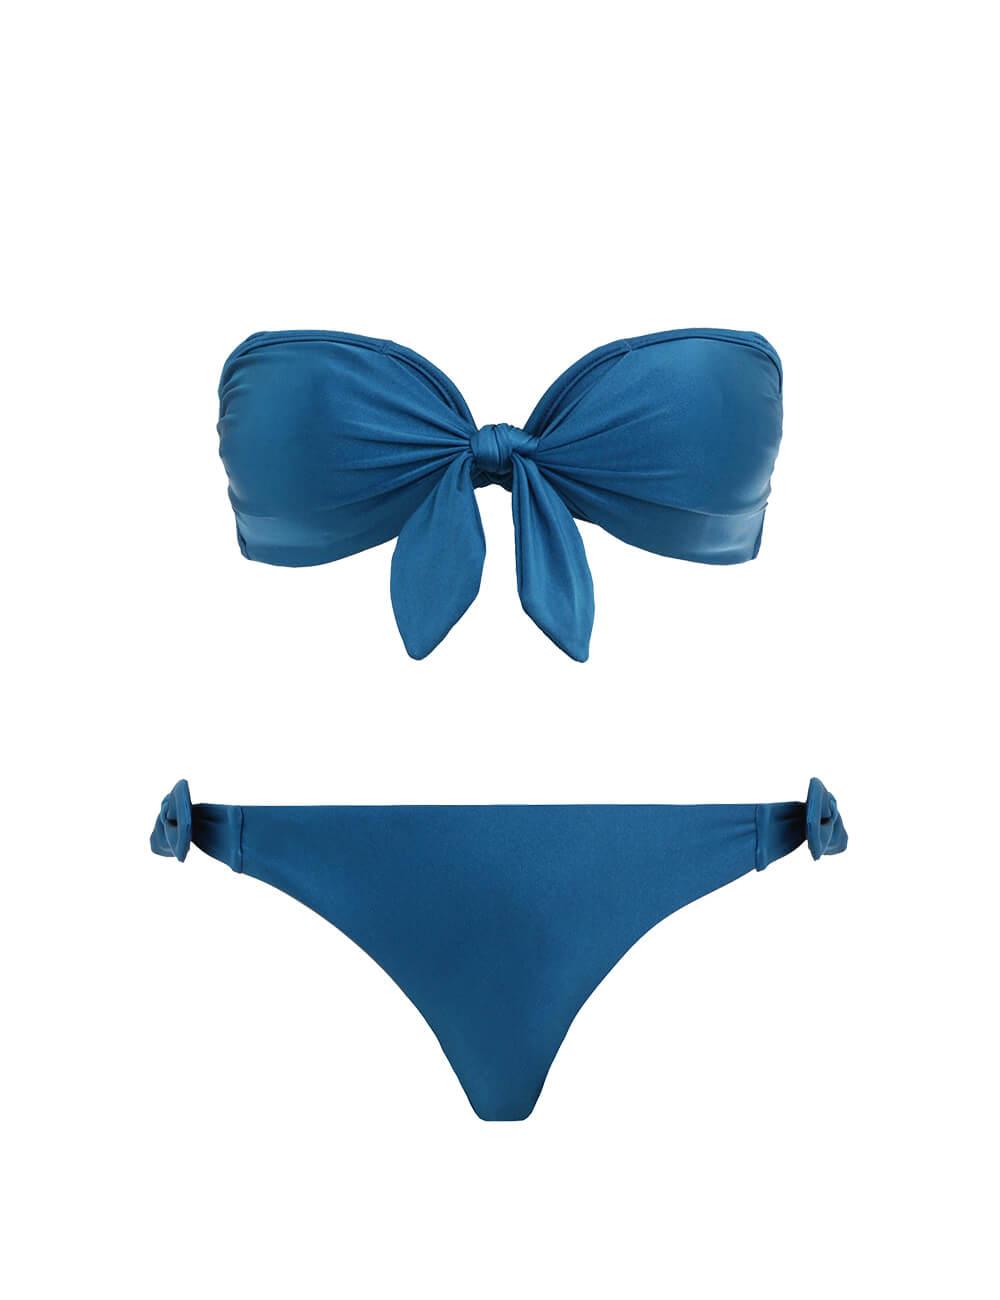 Suraya Tie Bikini